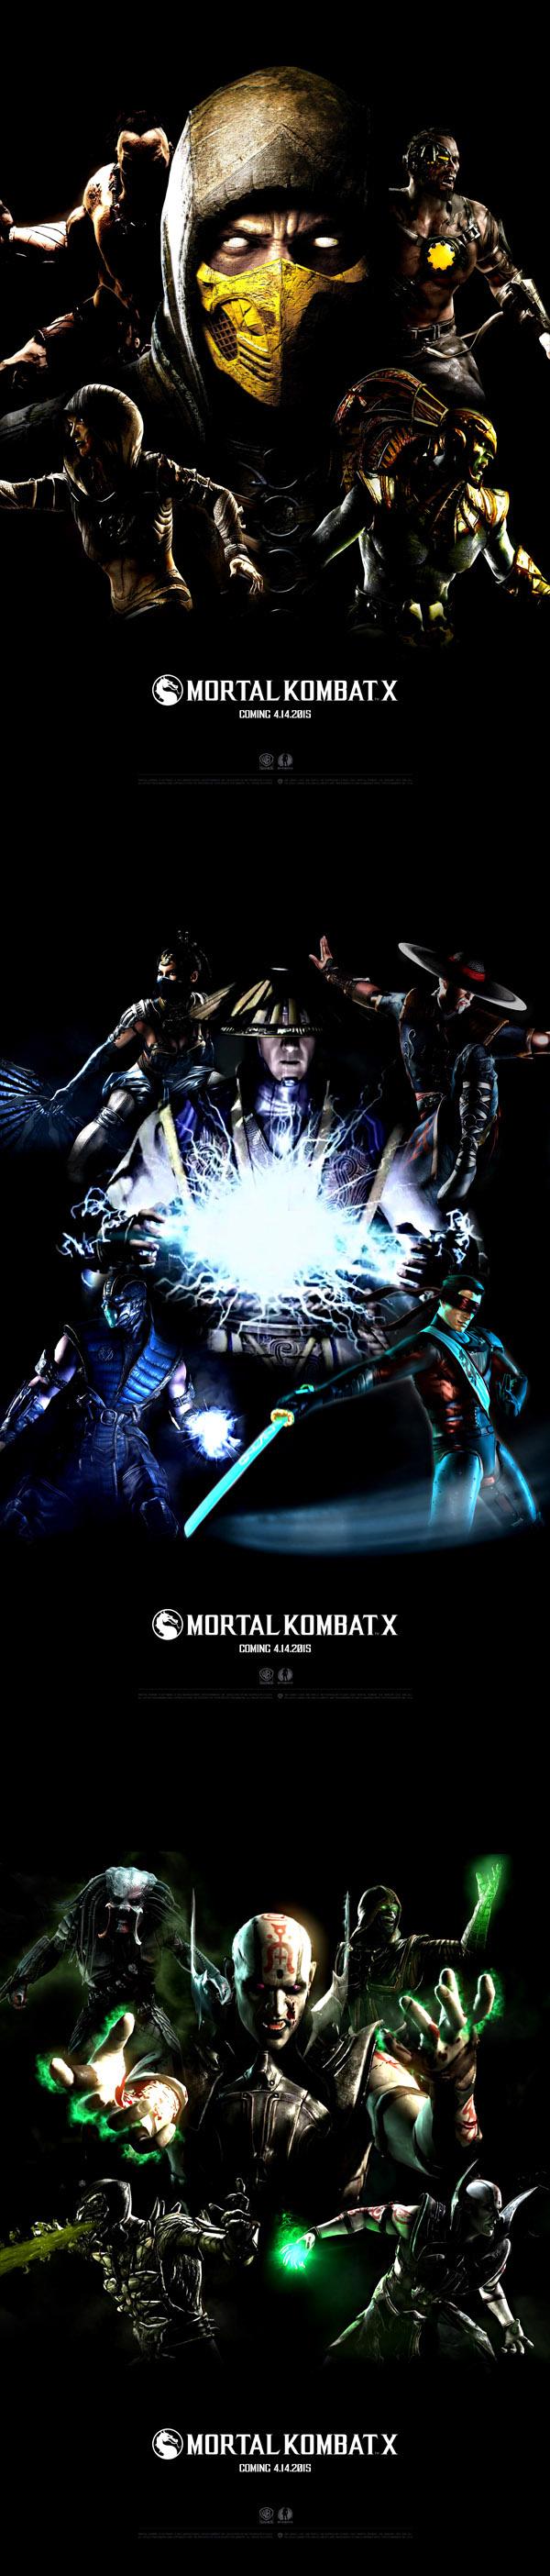 Mortal Kombat X Mkx Posters Fanart On Behance Comics Art